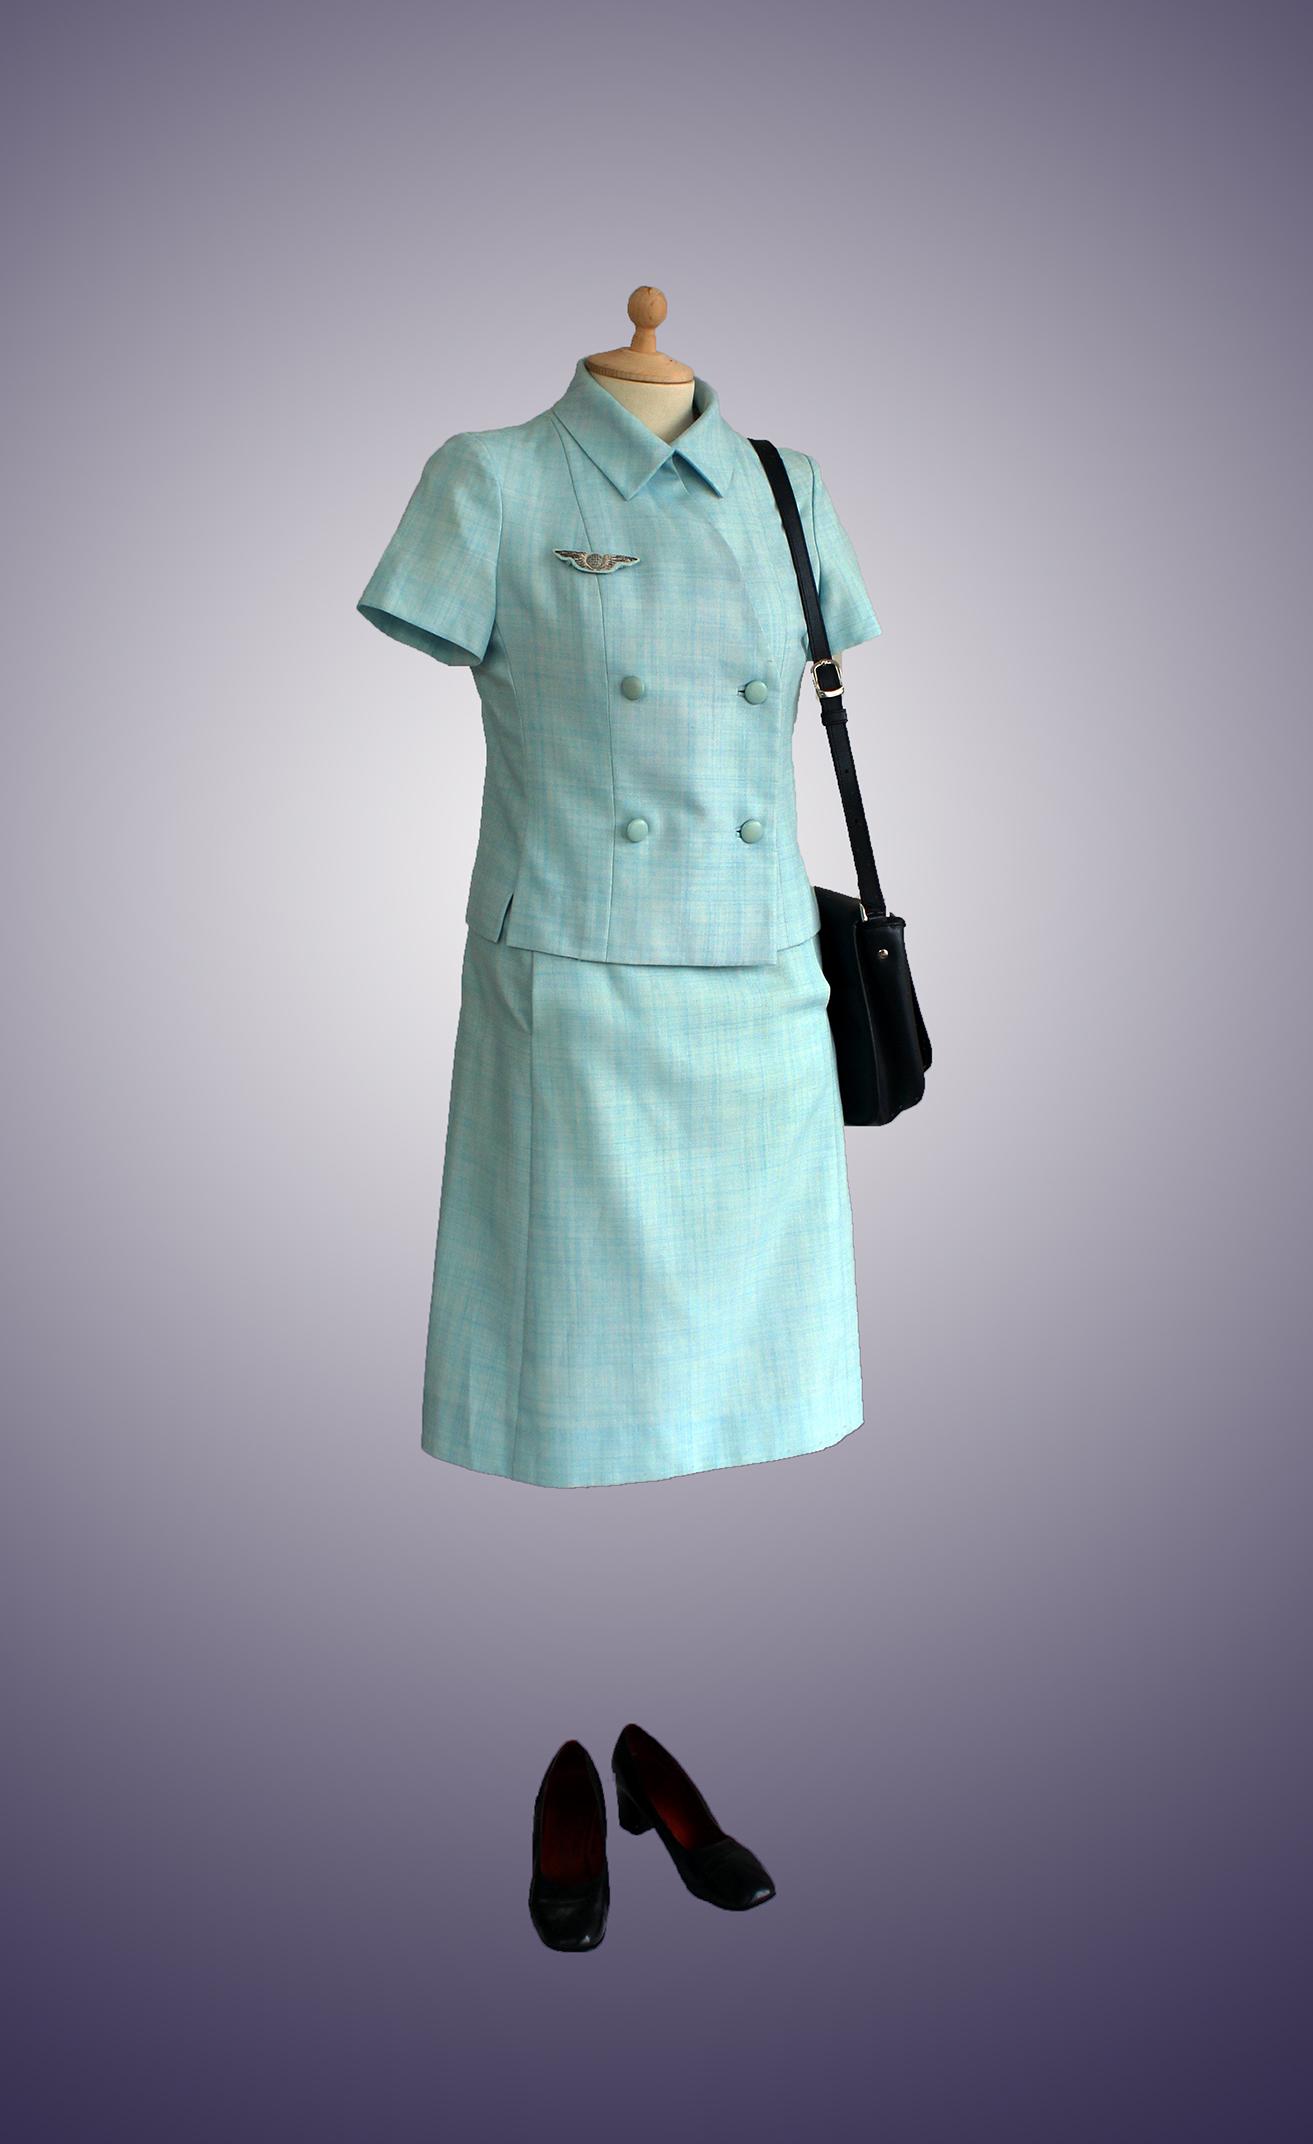 h tesse air france 1969 balenciaga tenue d 39 t bleue la compagnie du costume. Black Bedroom Furniture Sets. Home Design Ideas